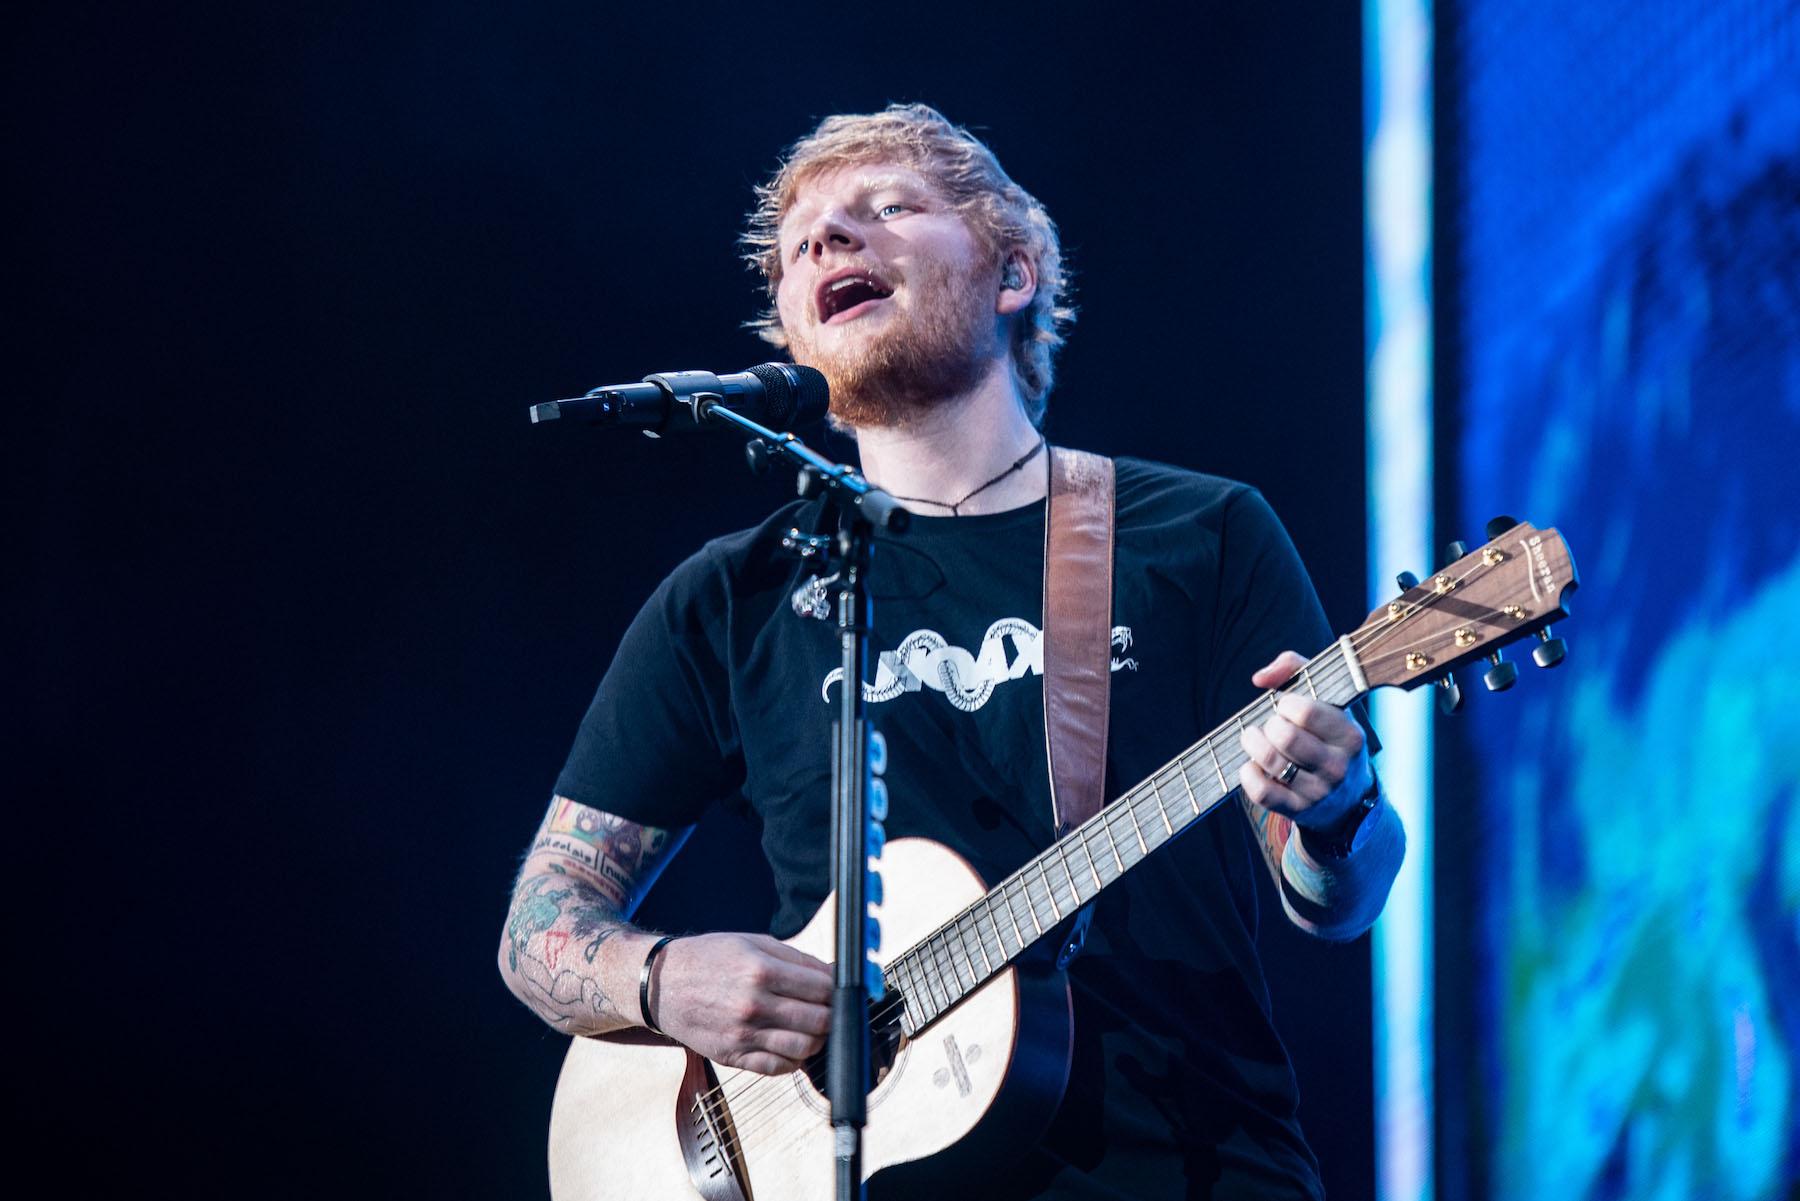 ed sheeran live in jakarta 2019